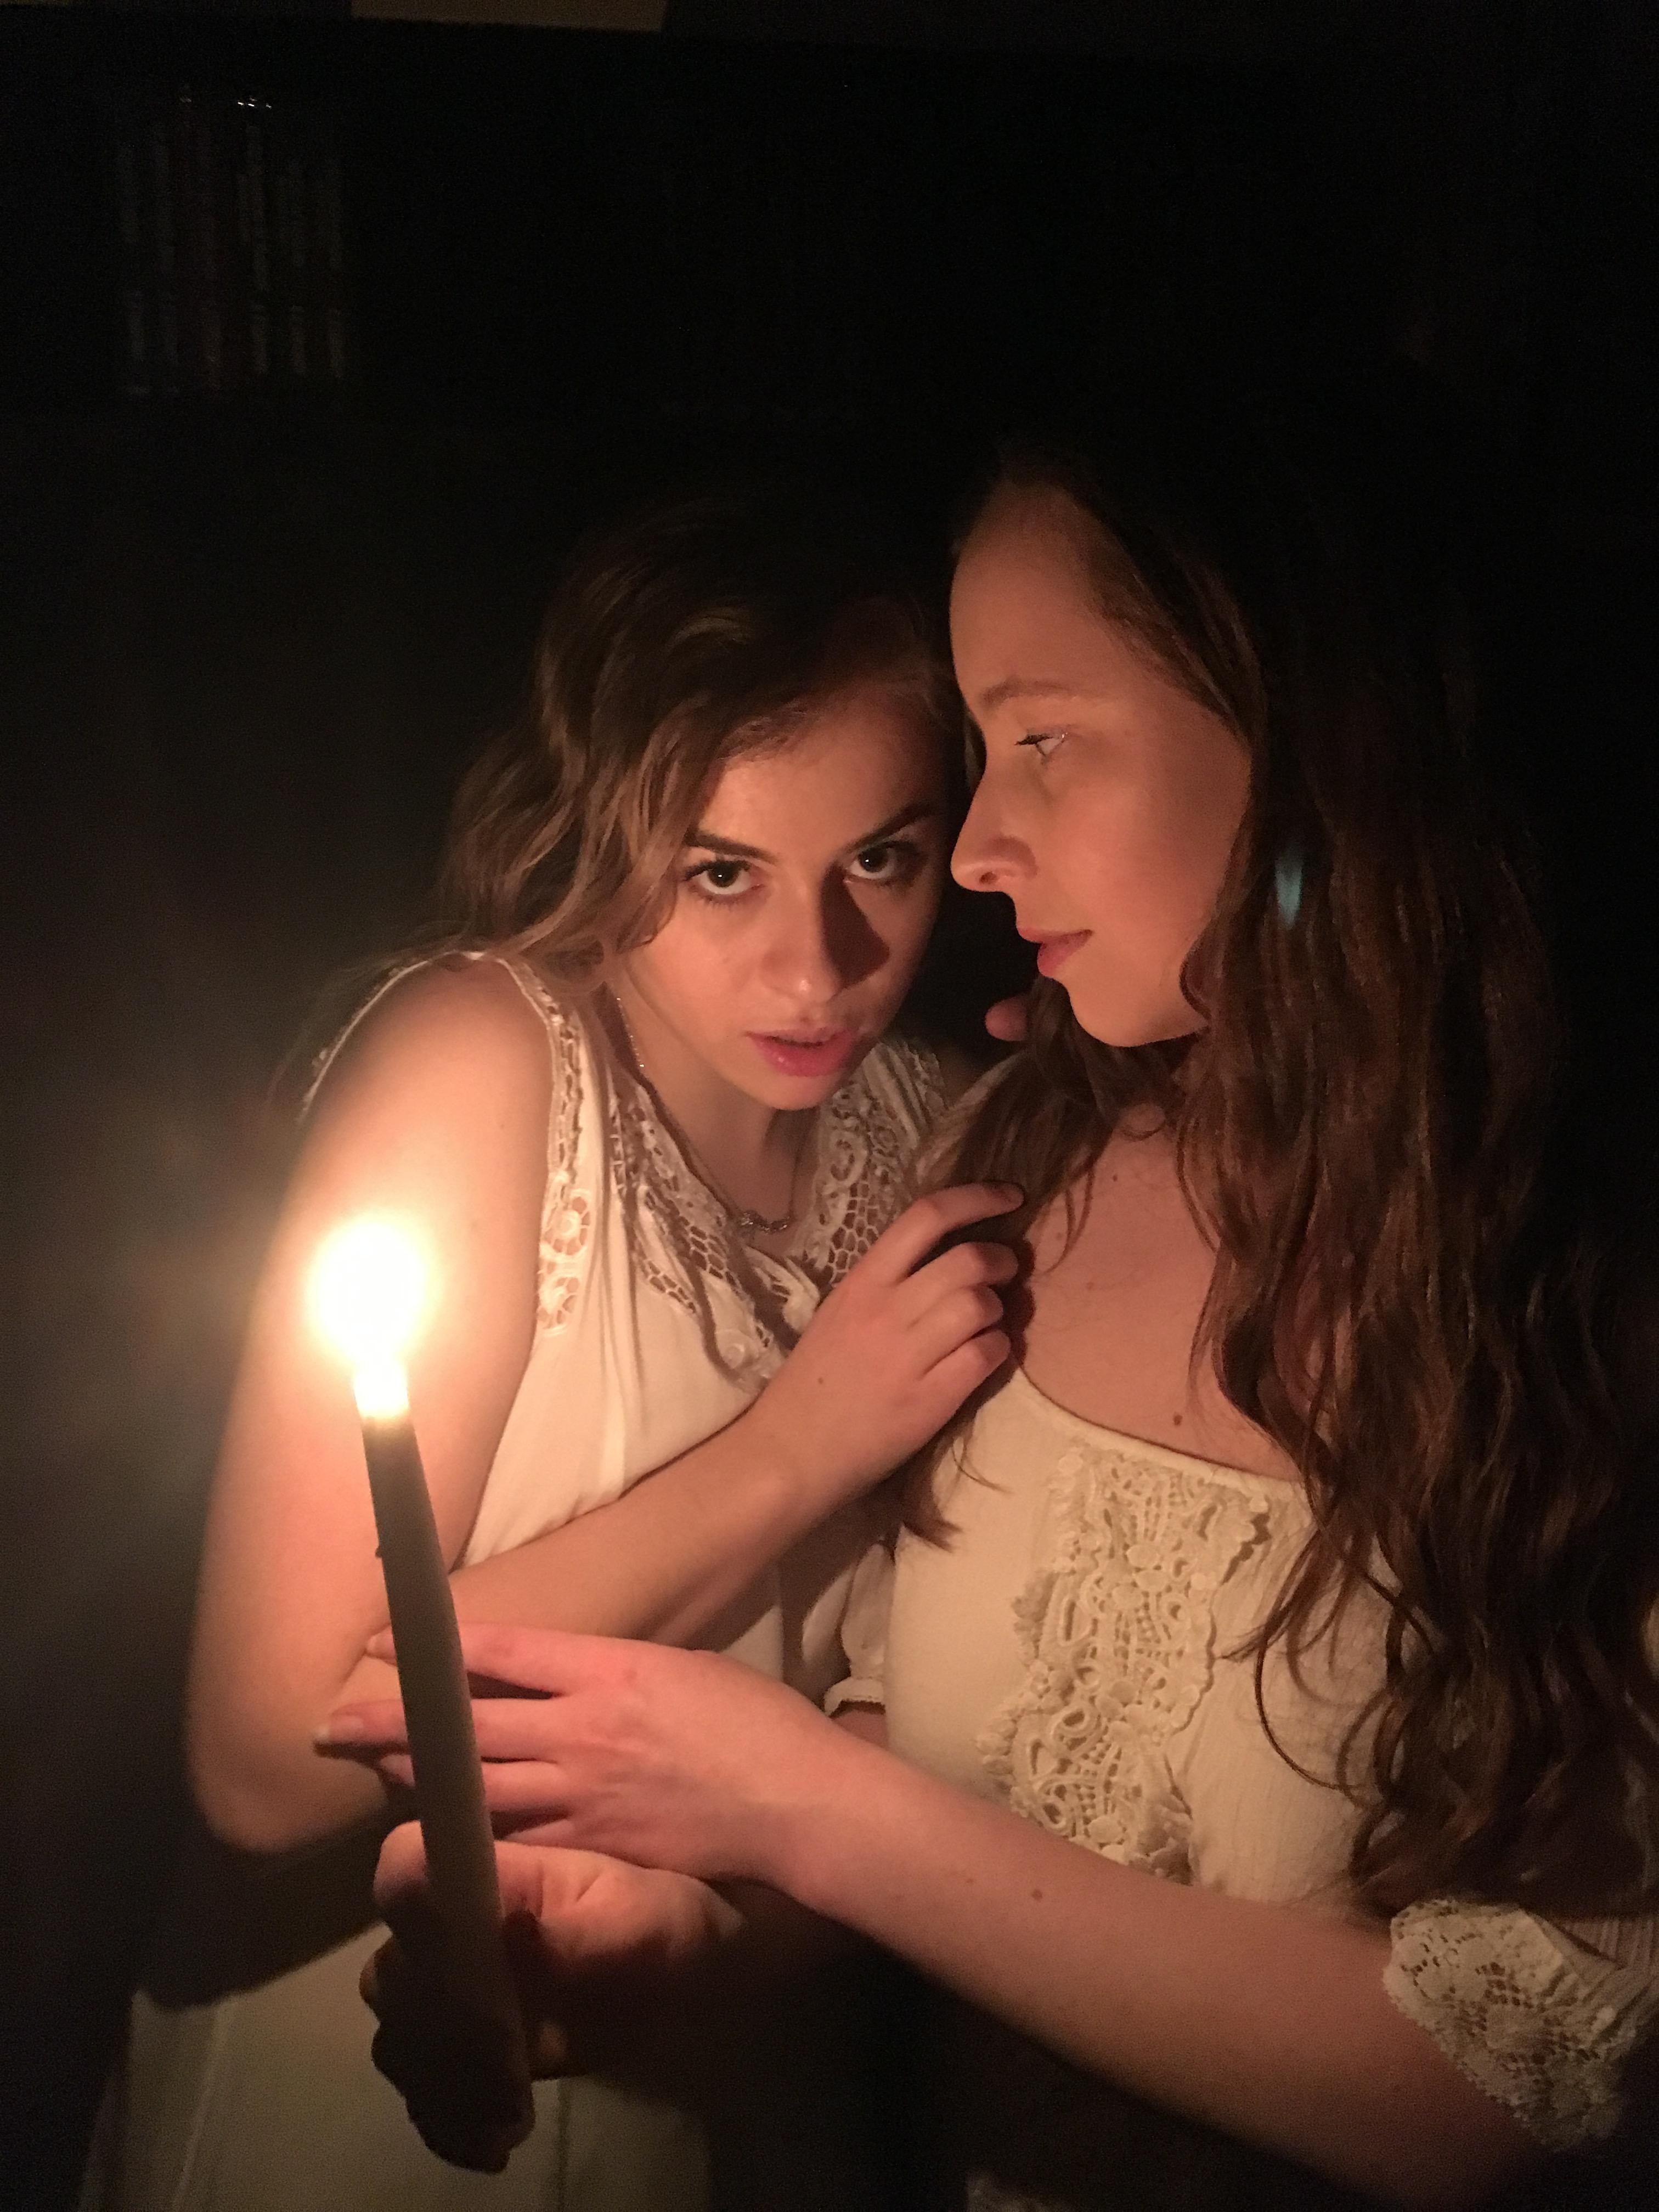 2018 lesbian movie vampire